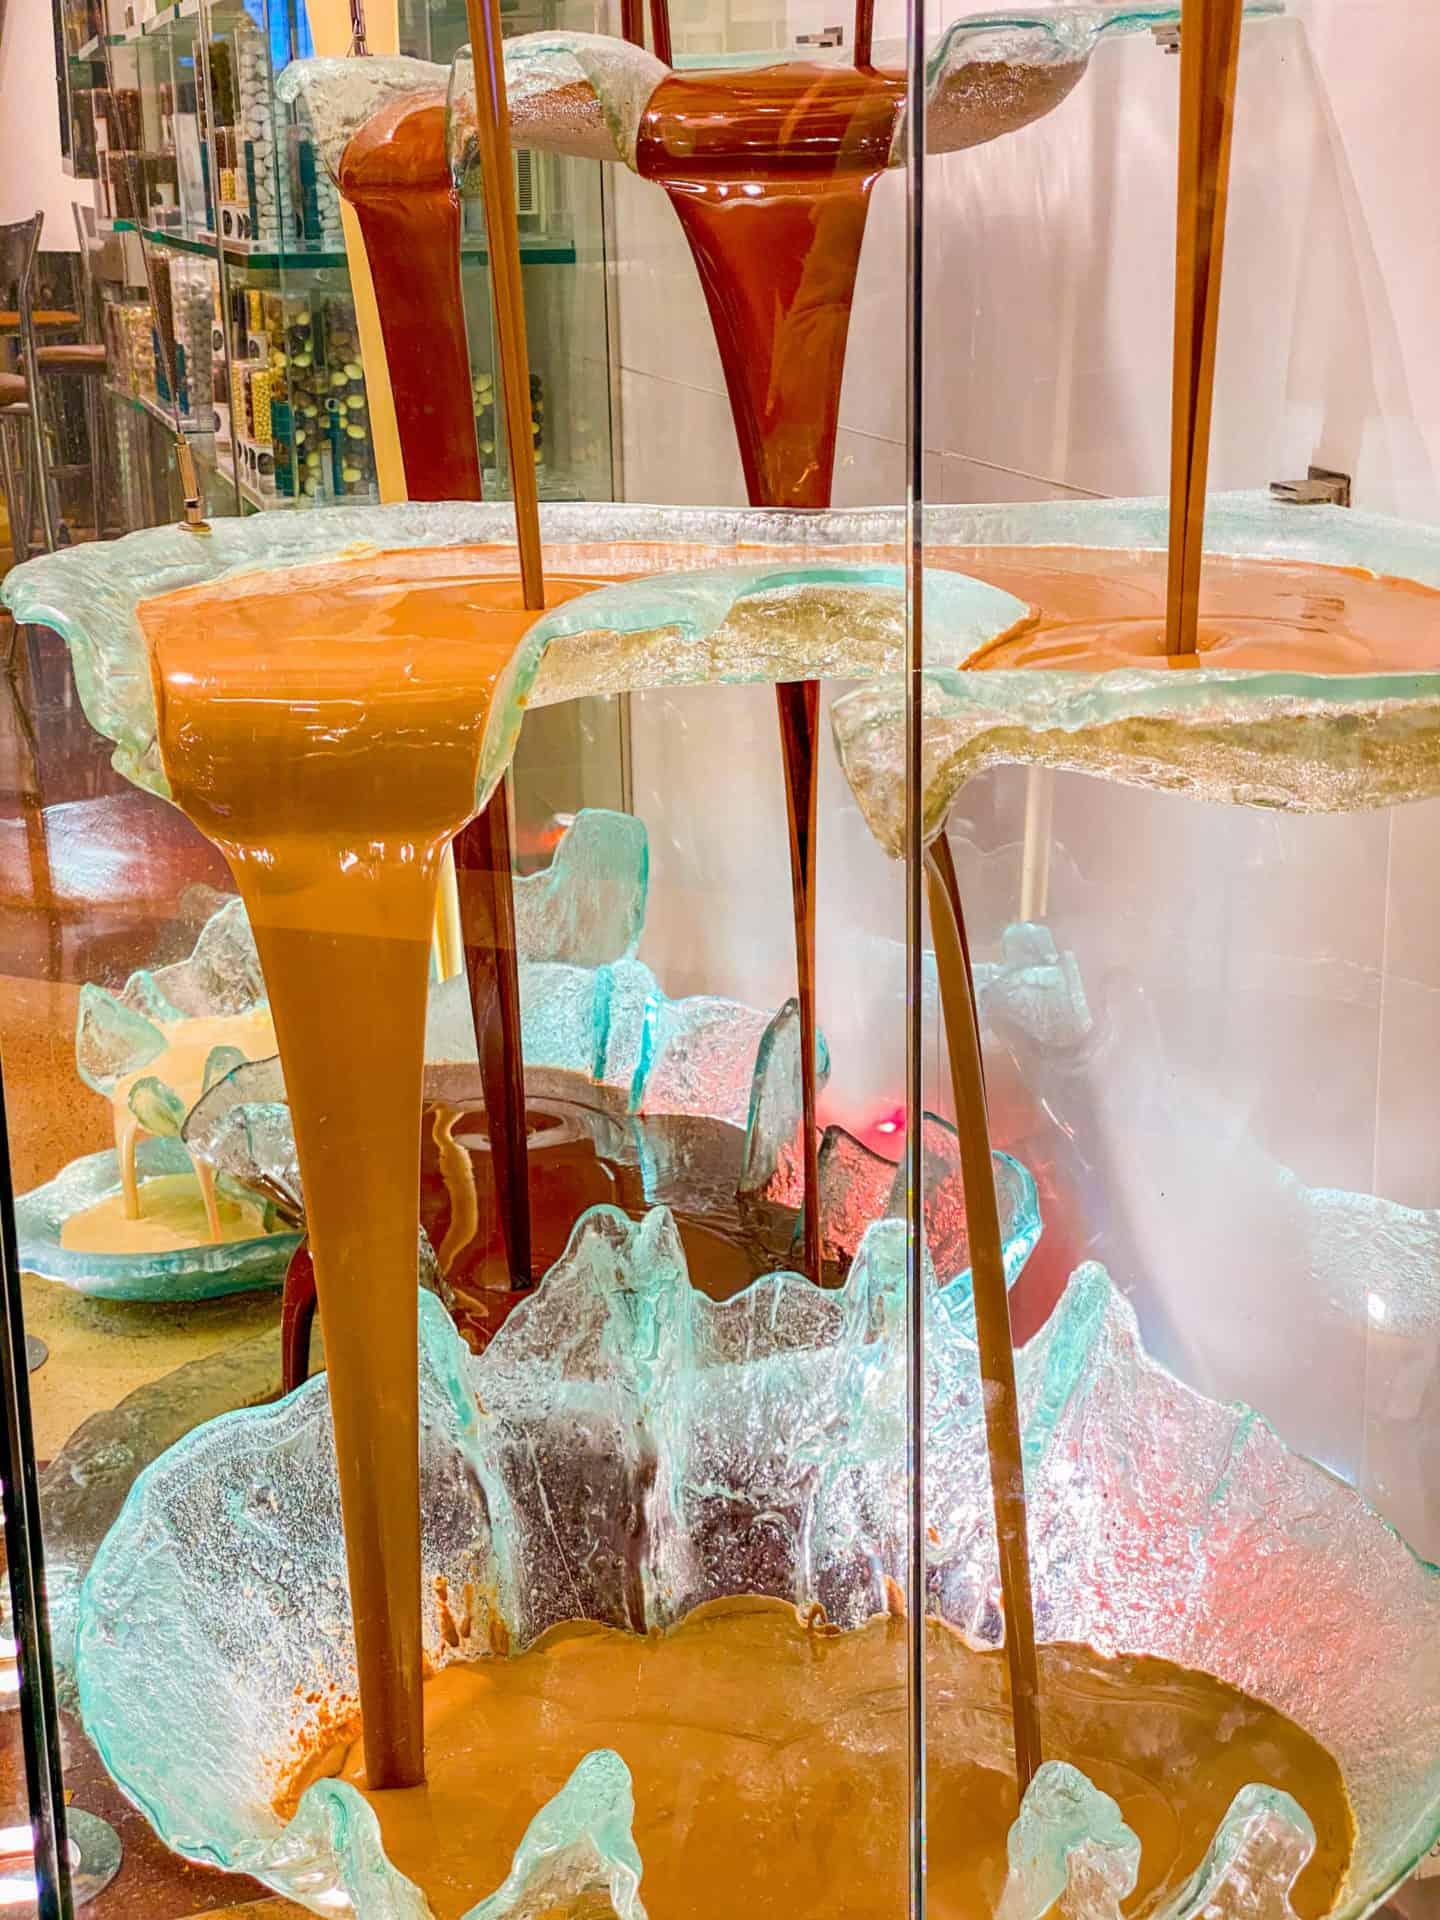 Las Vegas Bellagio Guinness World's Largest Chocolate Fountain